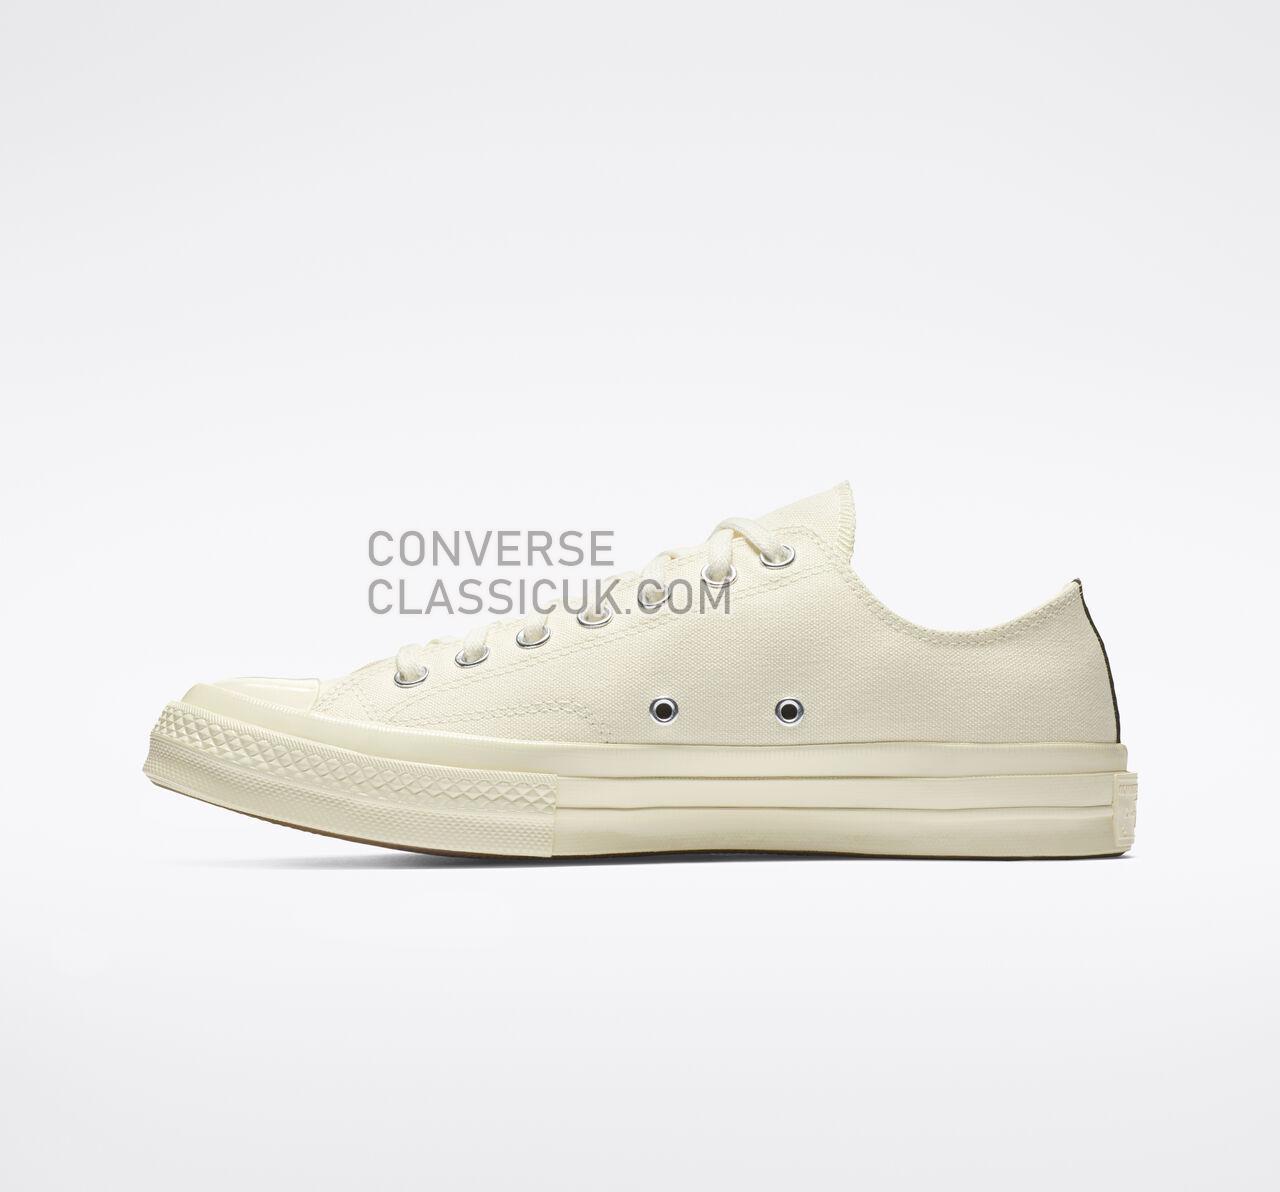 Converse x Comme des Garccedilons PLAY Chuck 70 Mens Womens Unisex 150207C Milk/White/High Risk Red Shoes